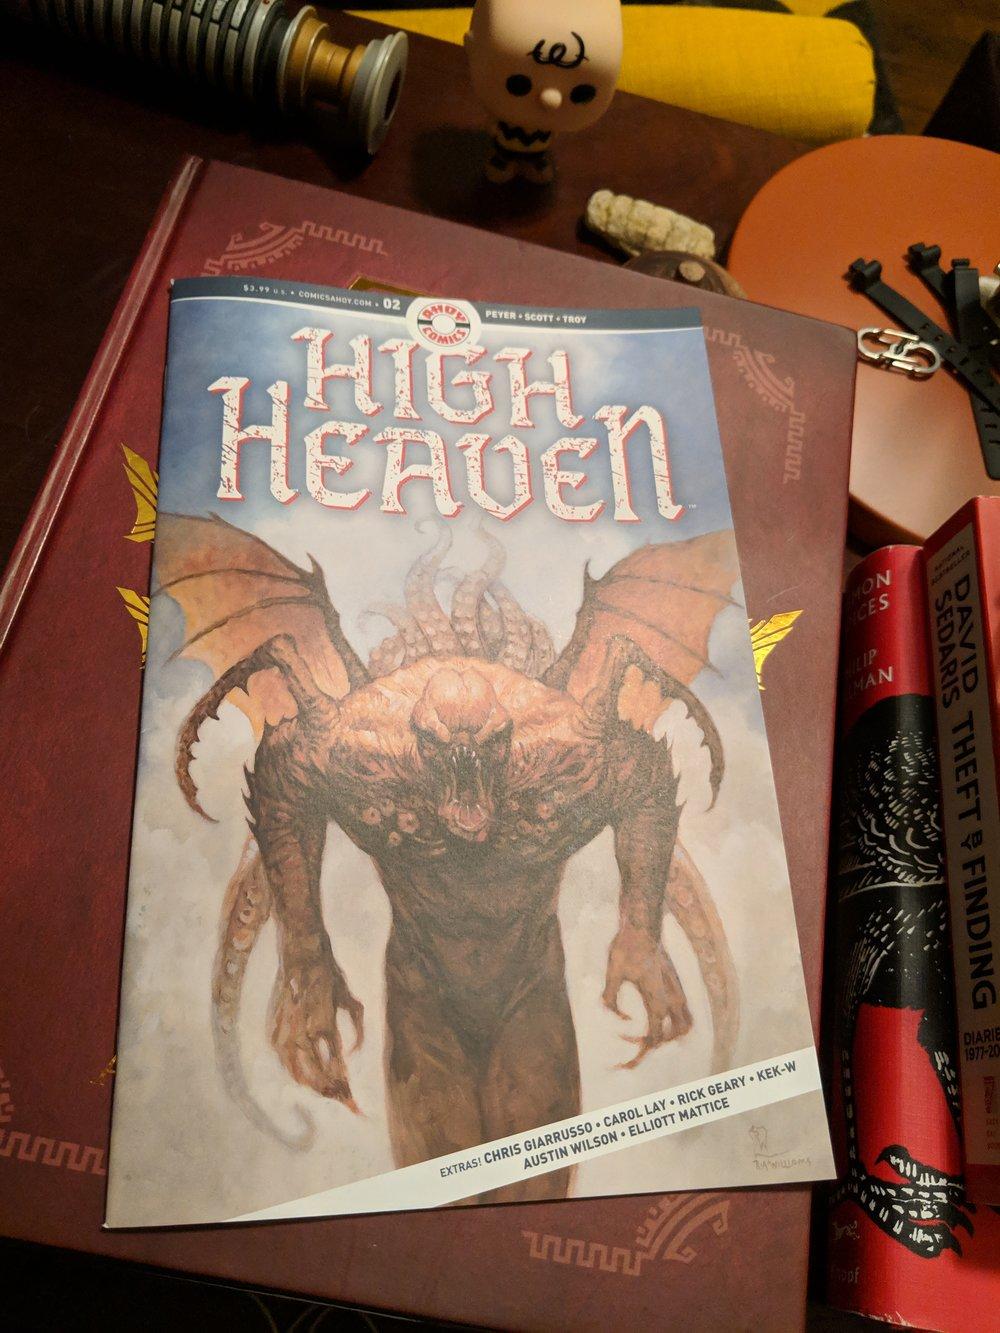 HighHeaven2-FeaturingBerastsbyAustinRWilson.jpg